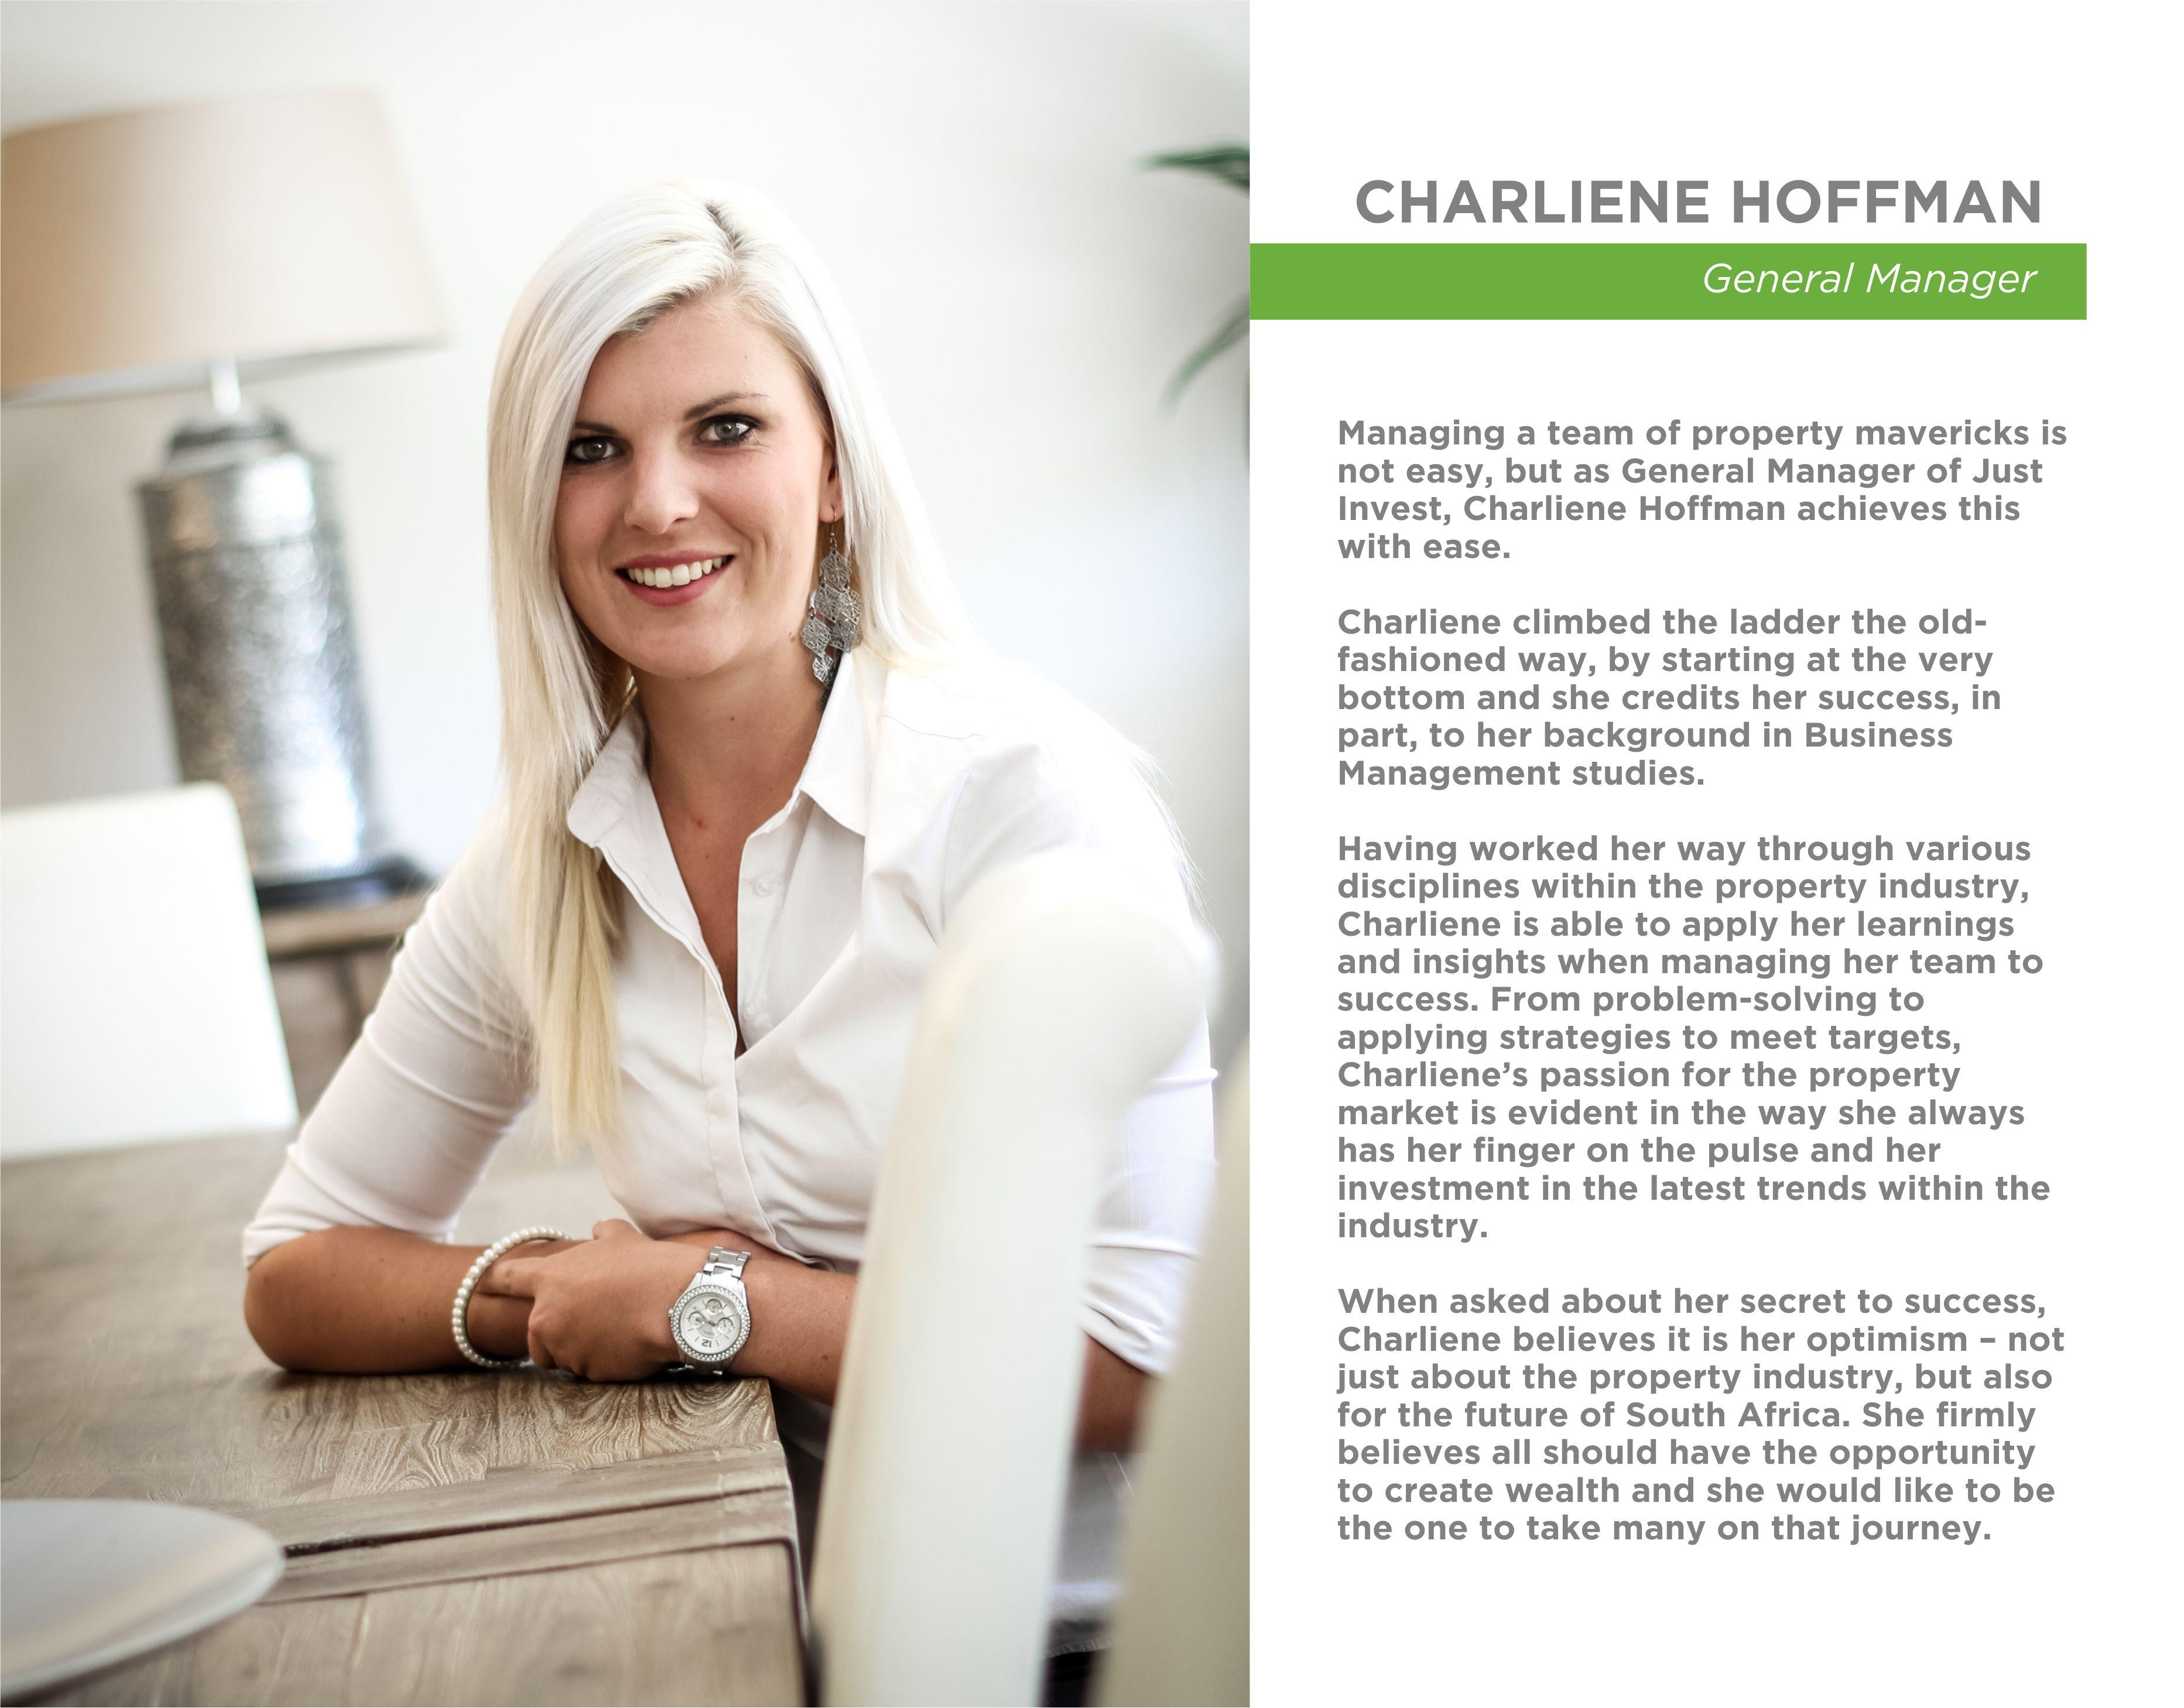 NEW STAFF BIO - Charliene Hoffman